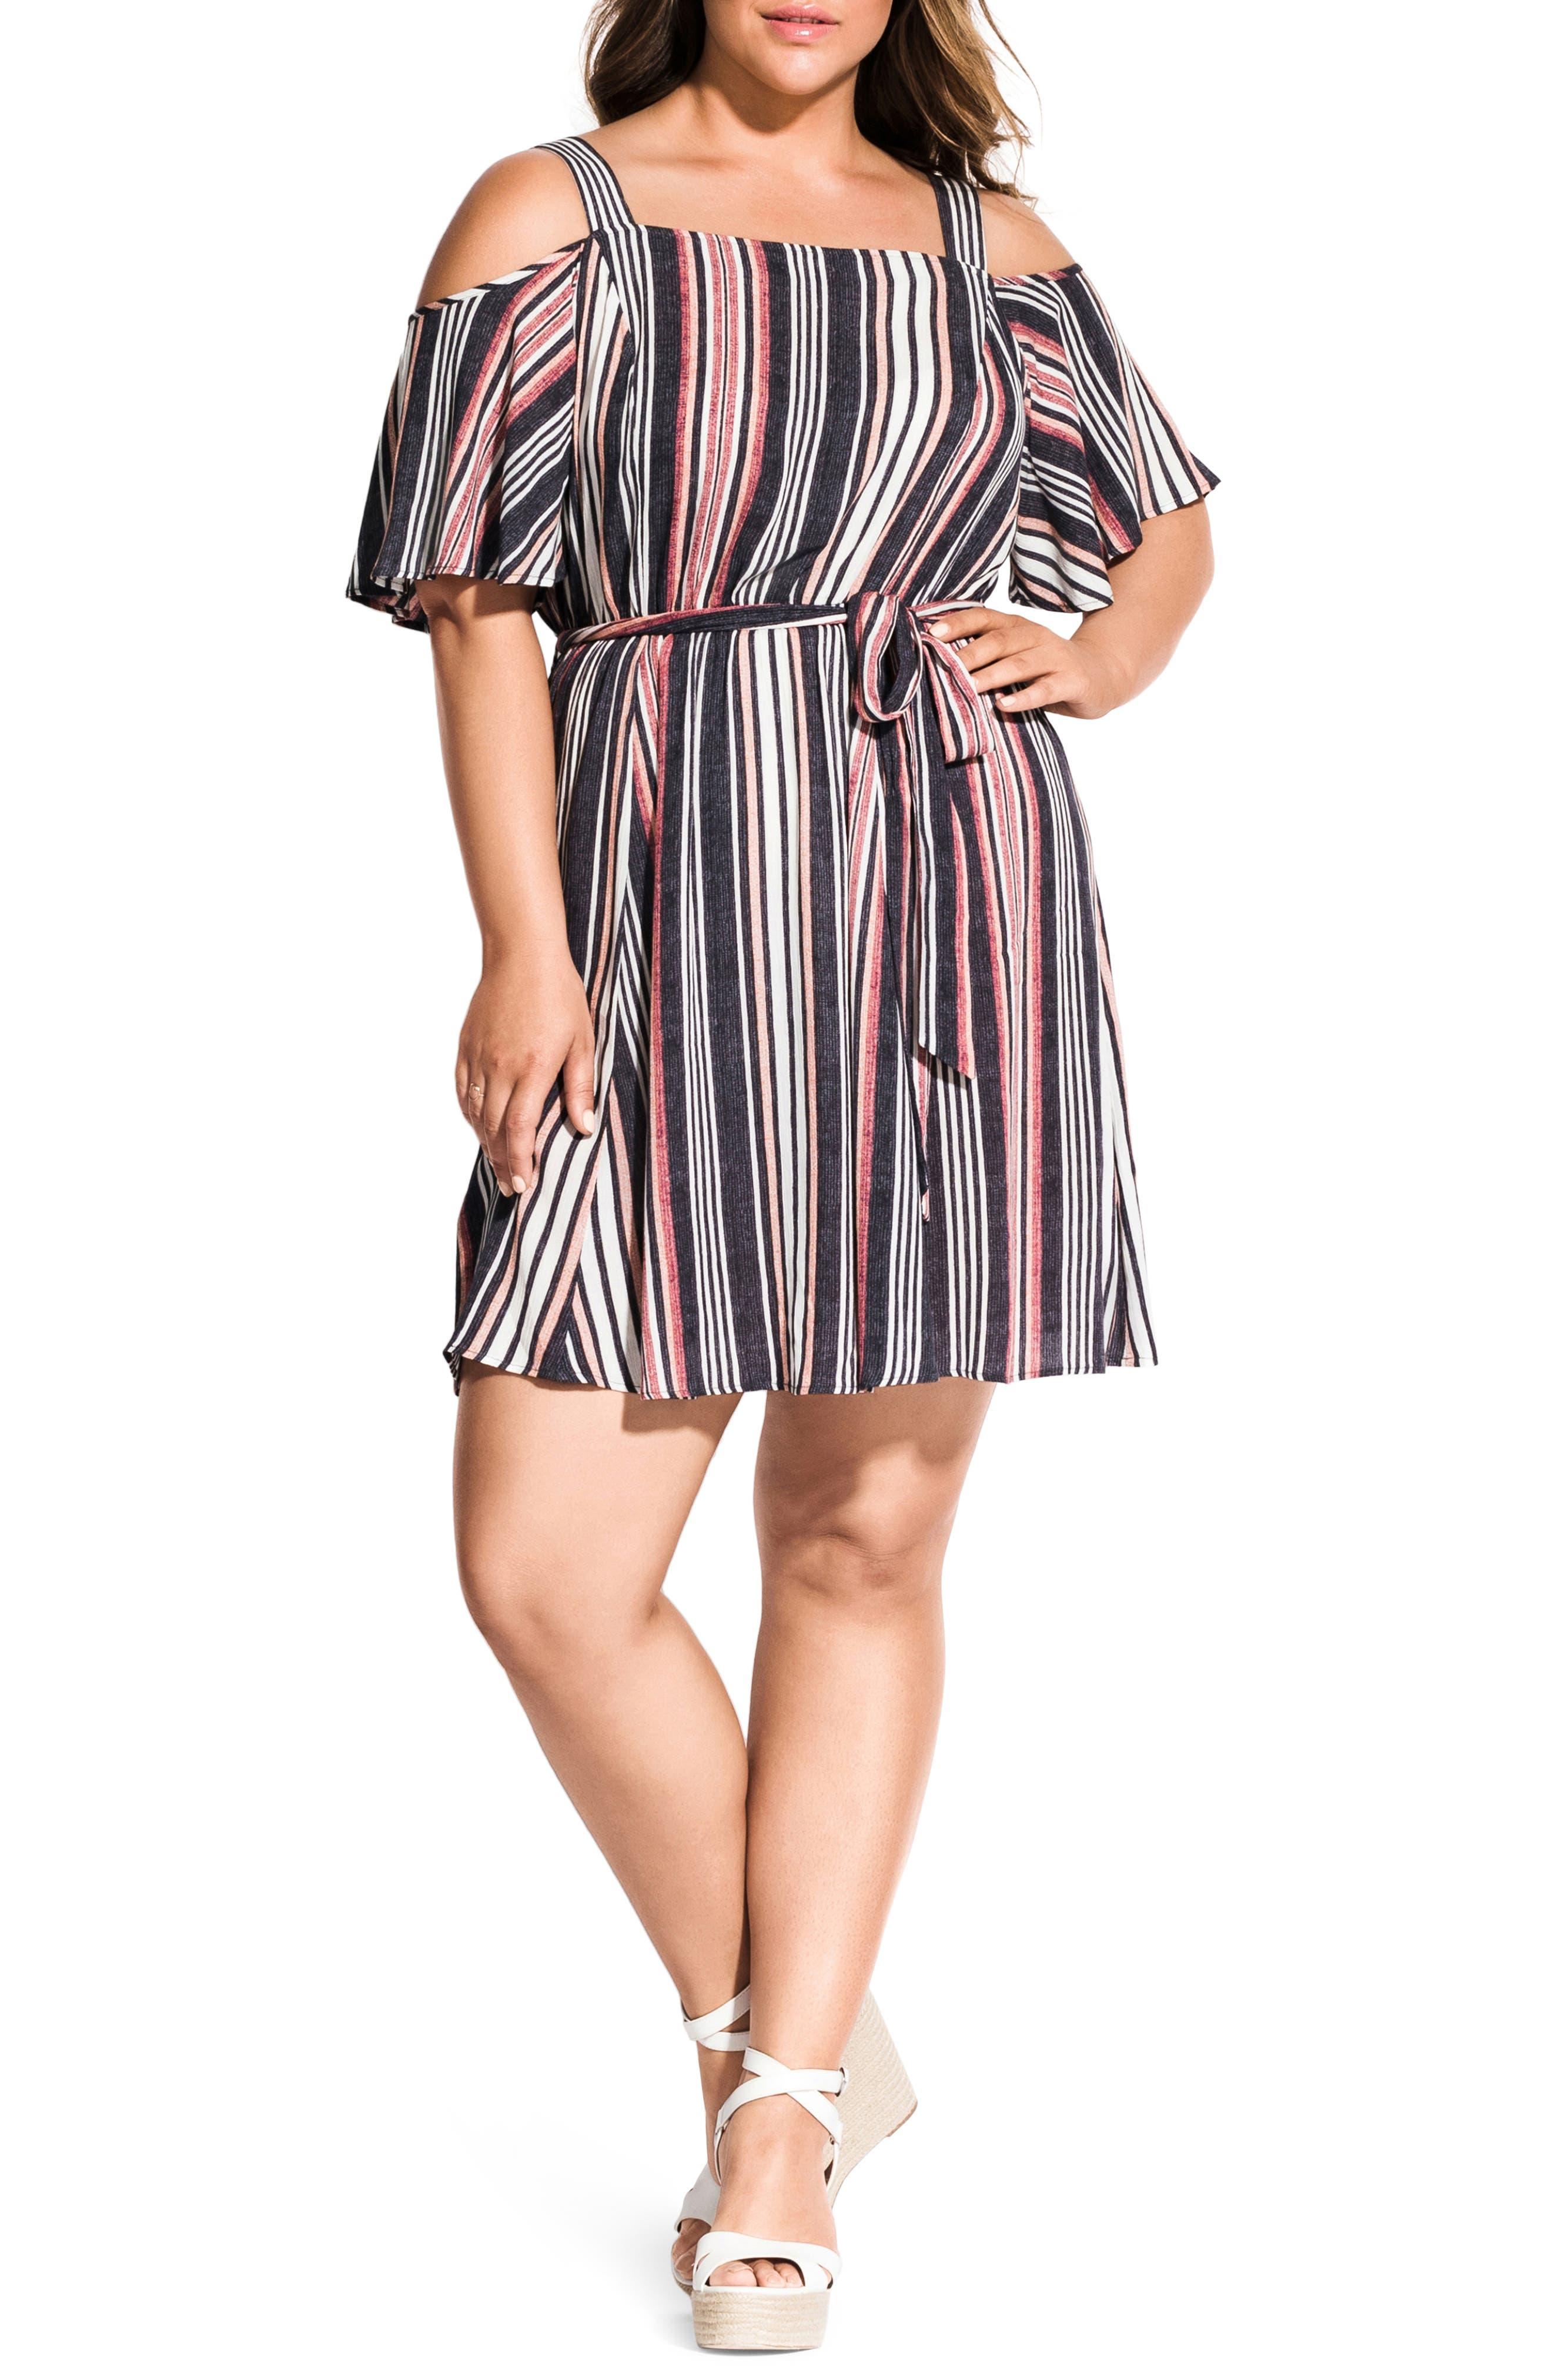 Plus Size City Chic Rose Stripe Cold Shoulder Dress, None